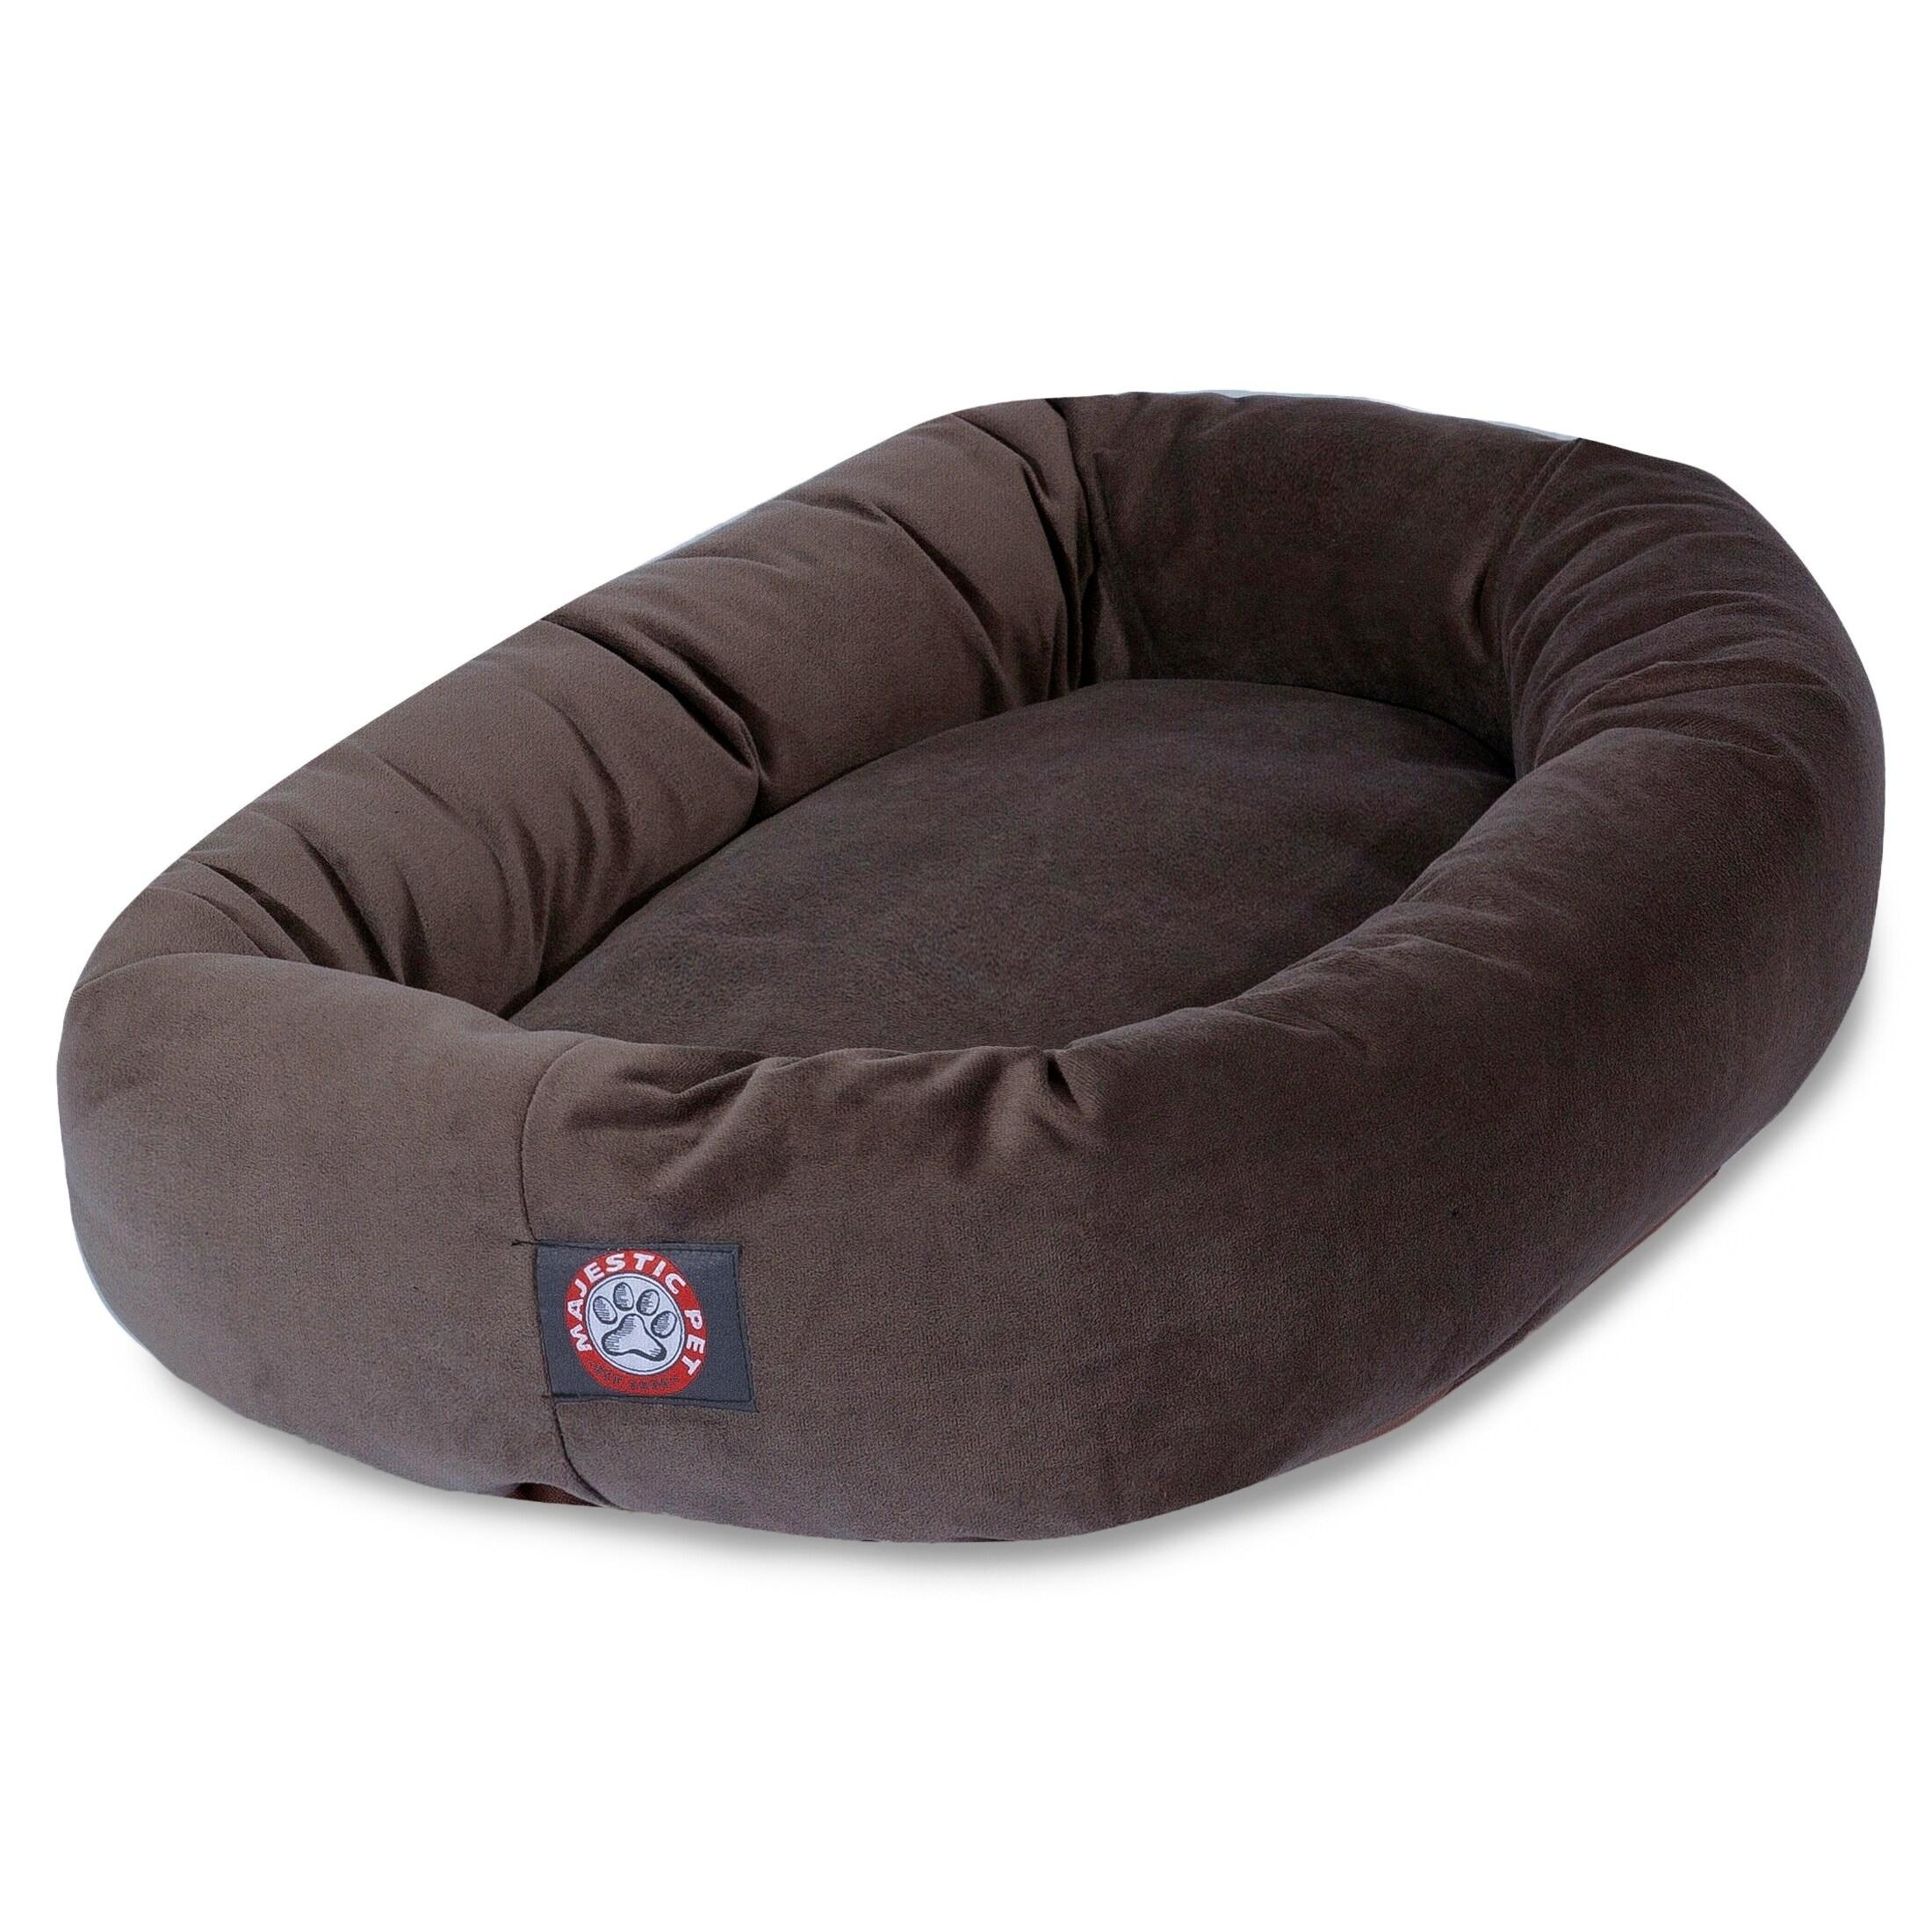 Majestic Pet Bagel Donut 40-inch Faux Suede Pet Bed (40-i...